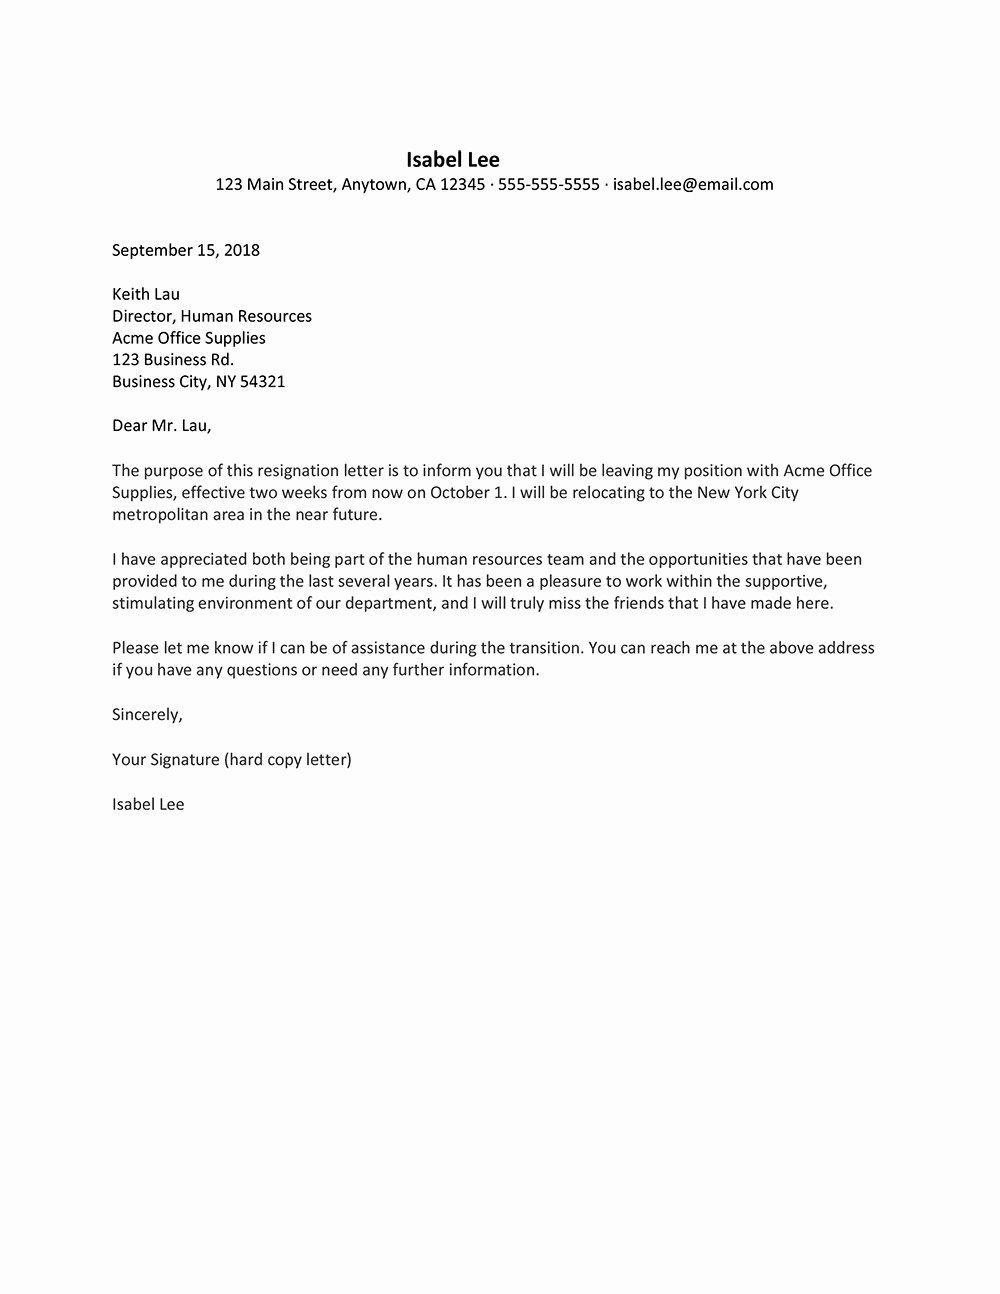 Letter Of Resignation Template Microsoft Awesome Microsoft Word Resignation Letter Template Examples